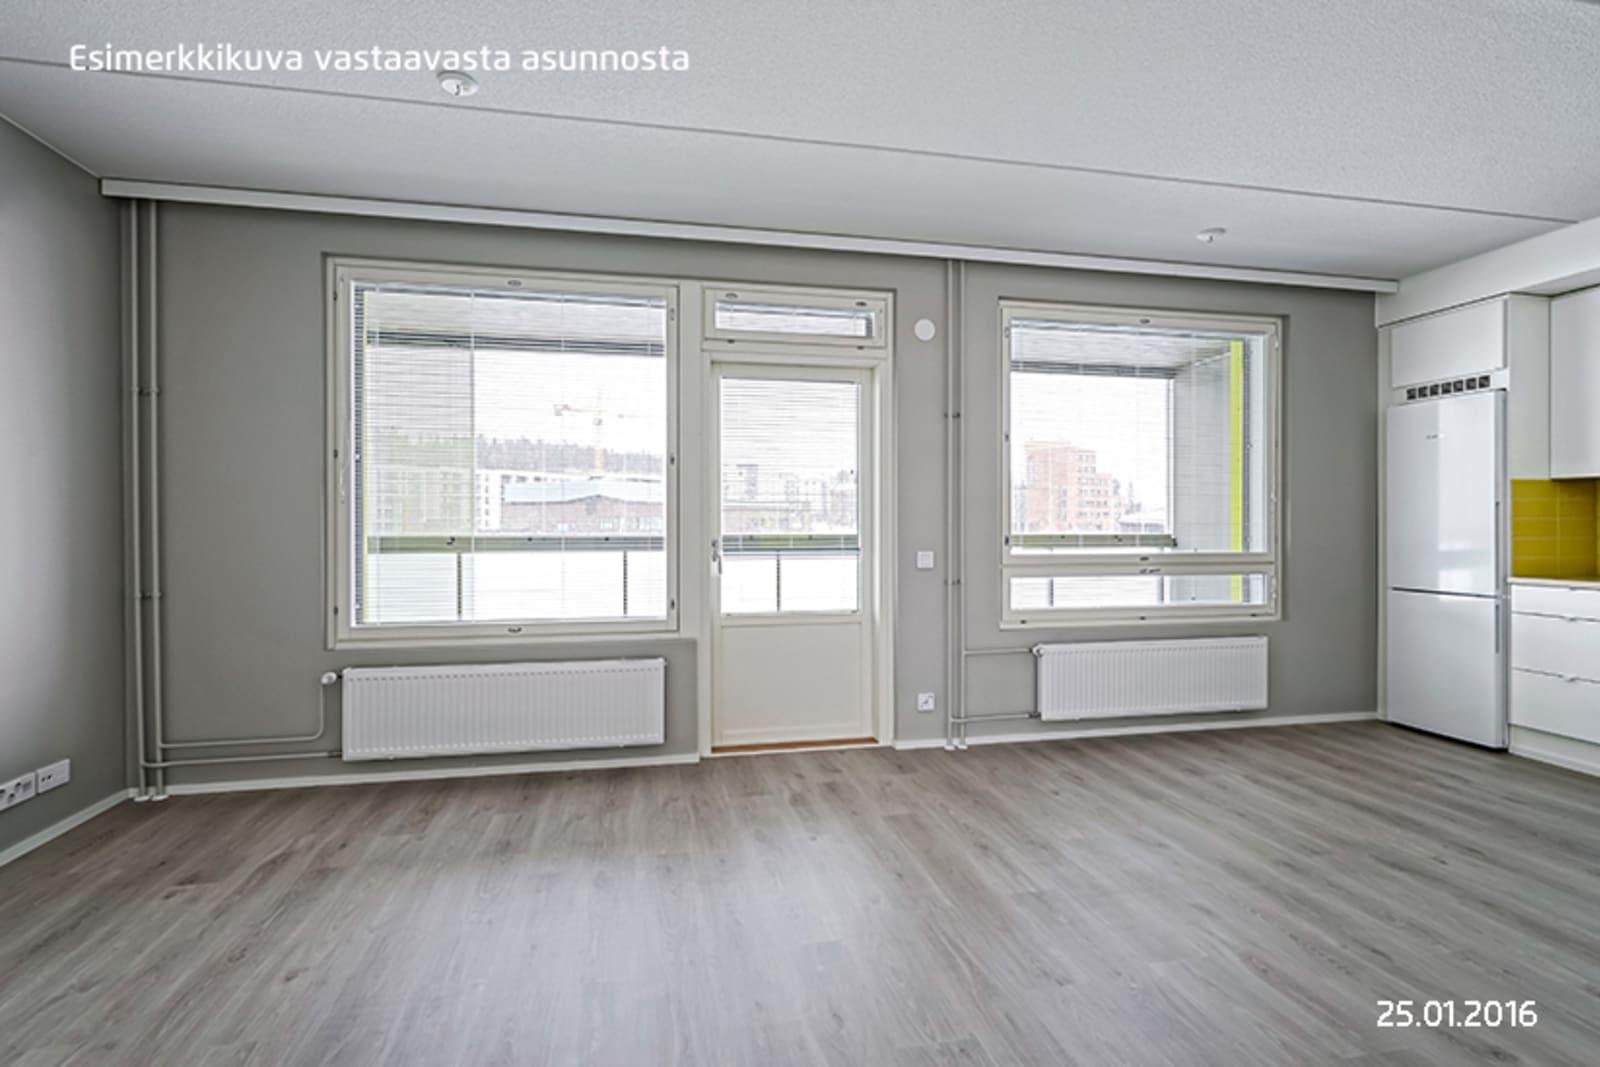 Espoo, Saunalahti, Magneettikatu 8 A 024